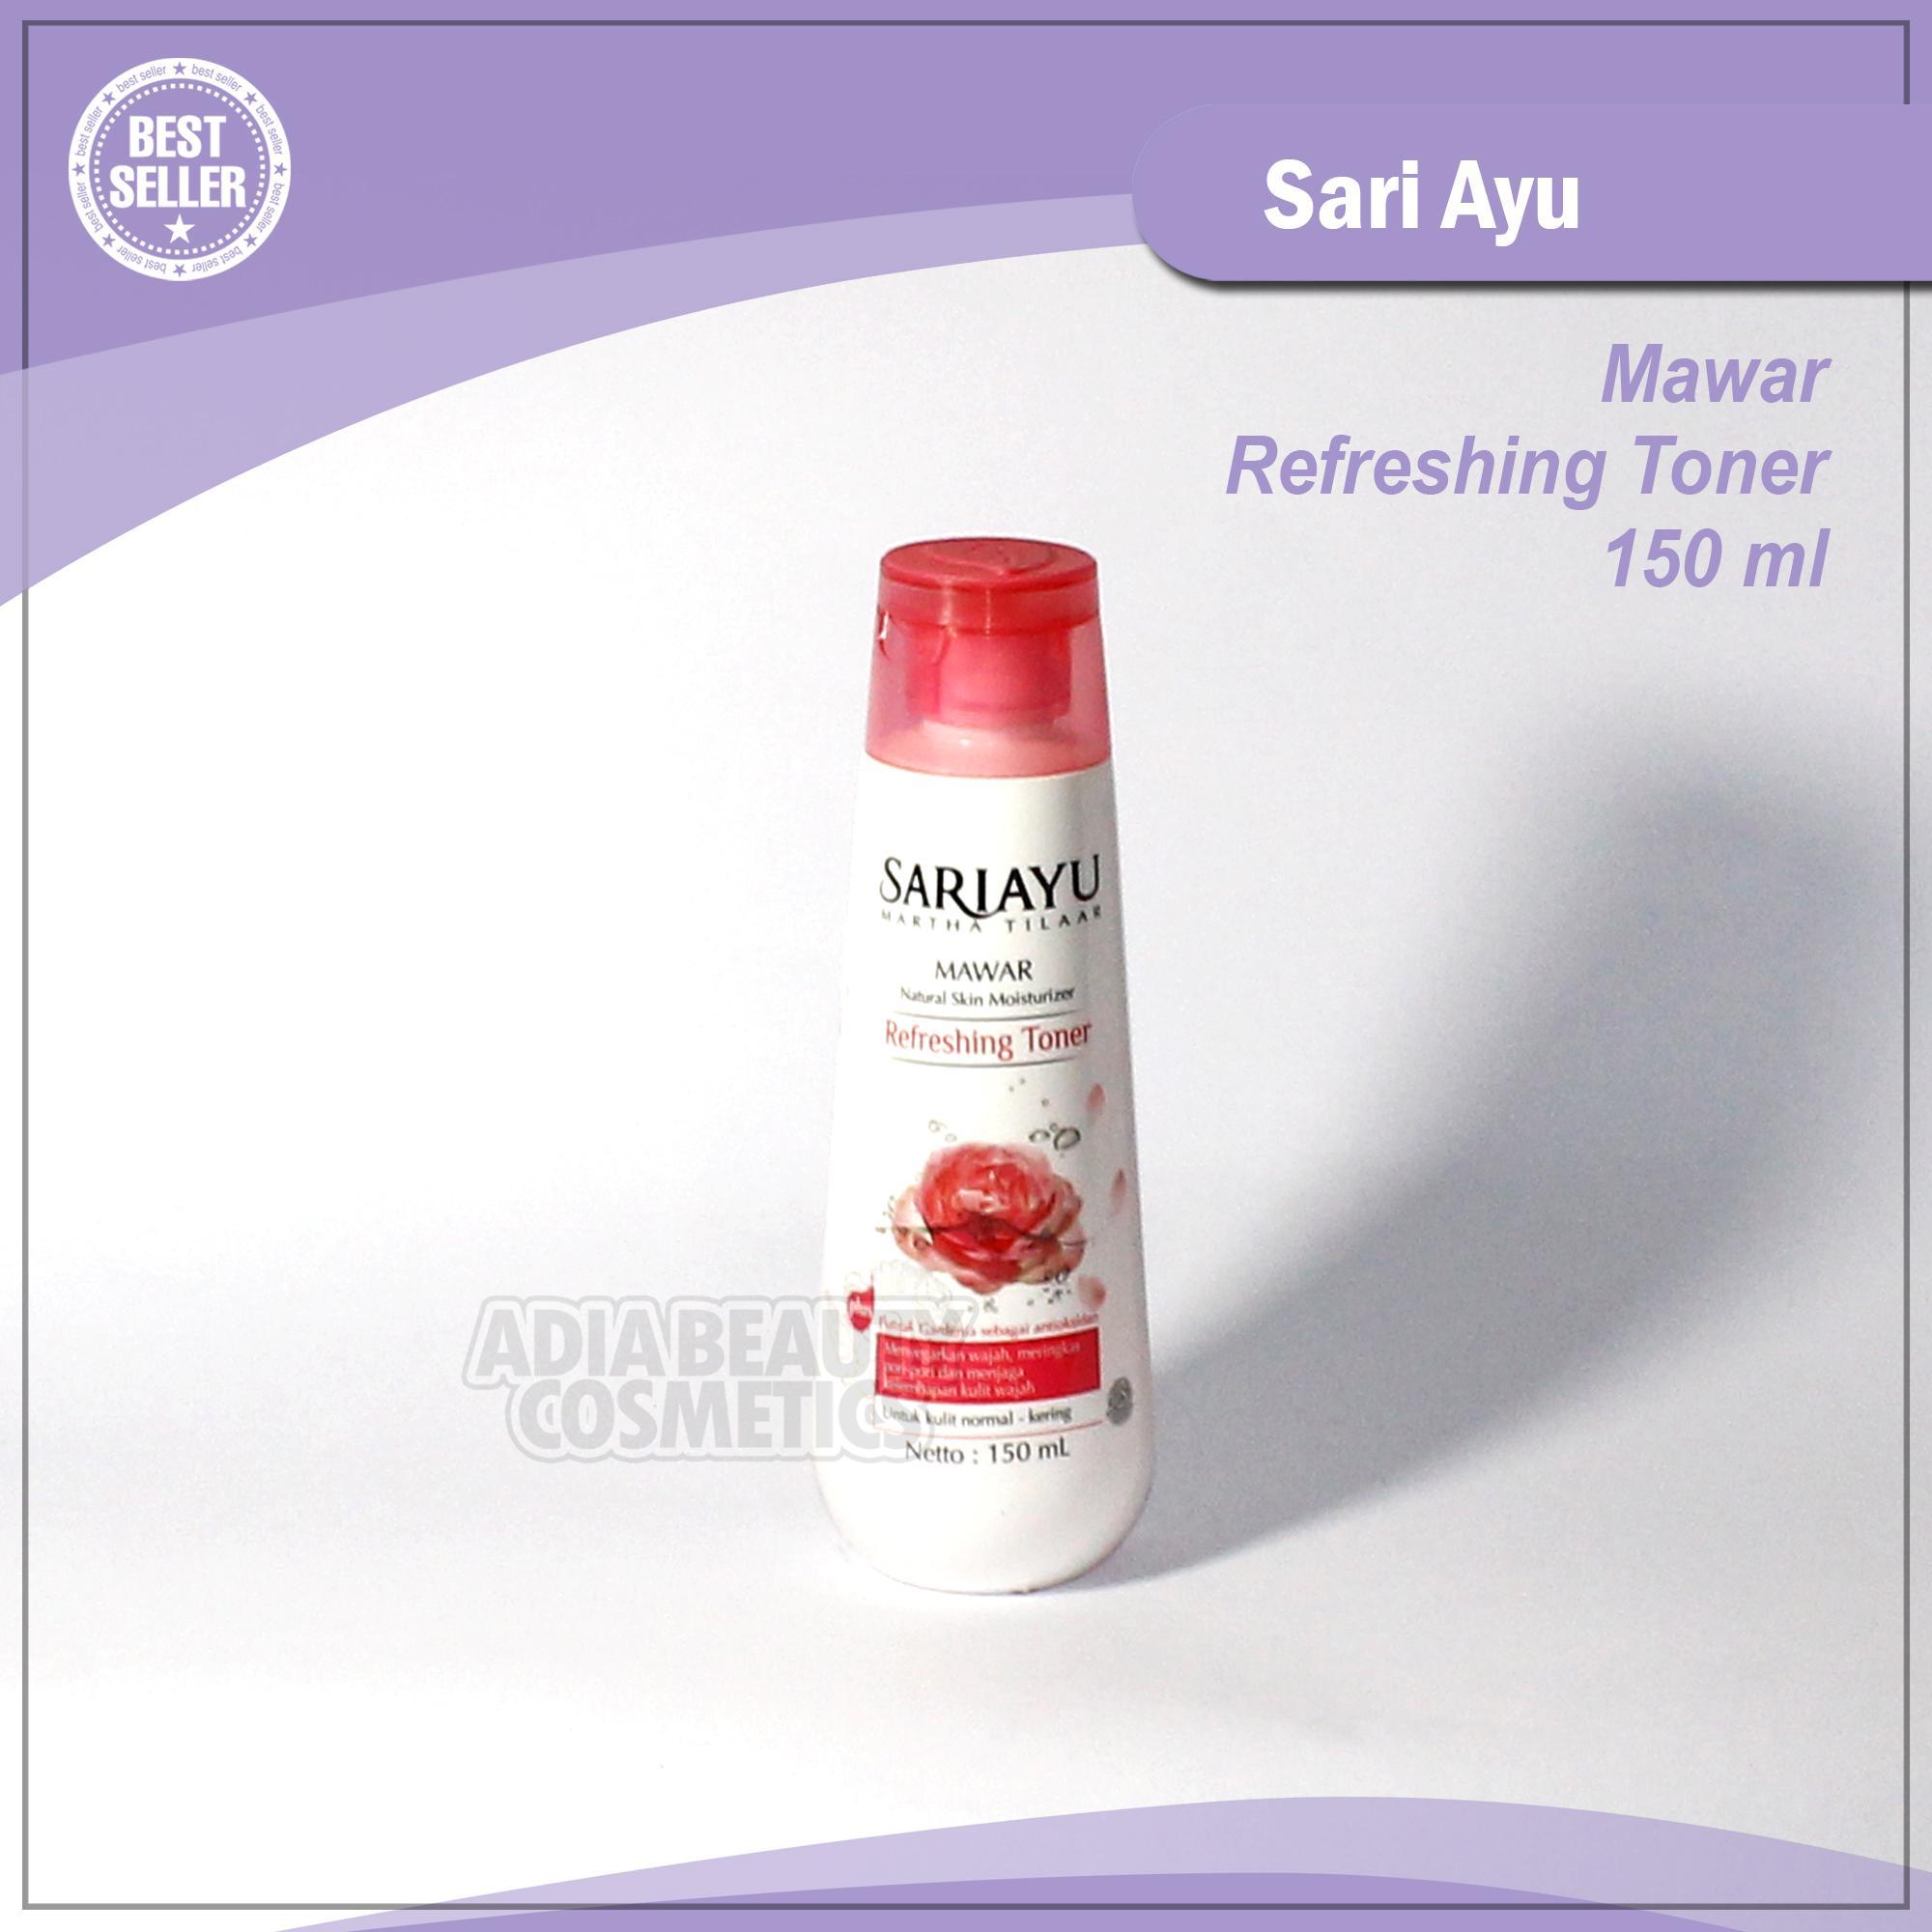 Adia Beauty Cosmetics - SARIAYU MAWAR Refreshing Toner - 150 ml // Penyegar Sari Ayu